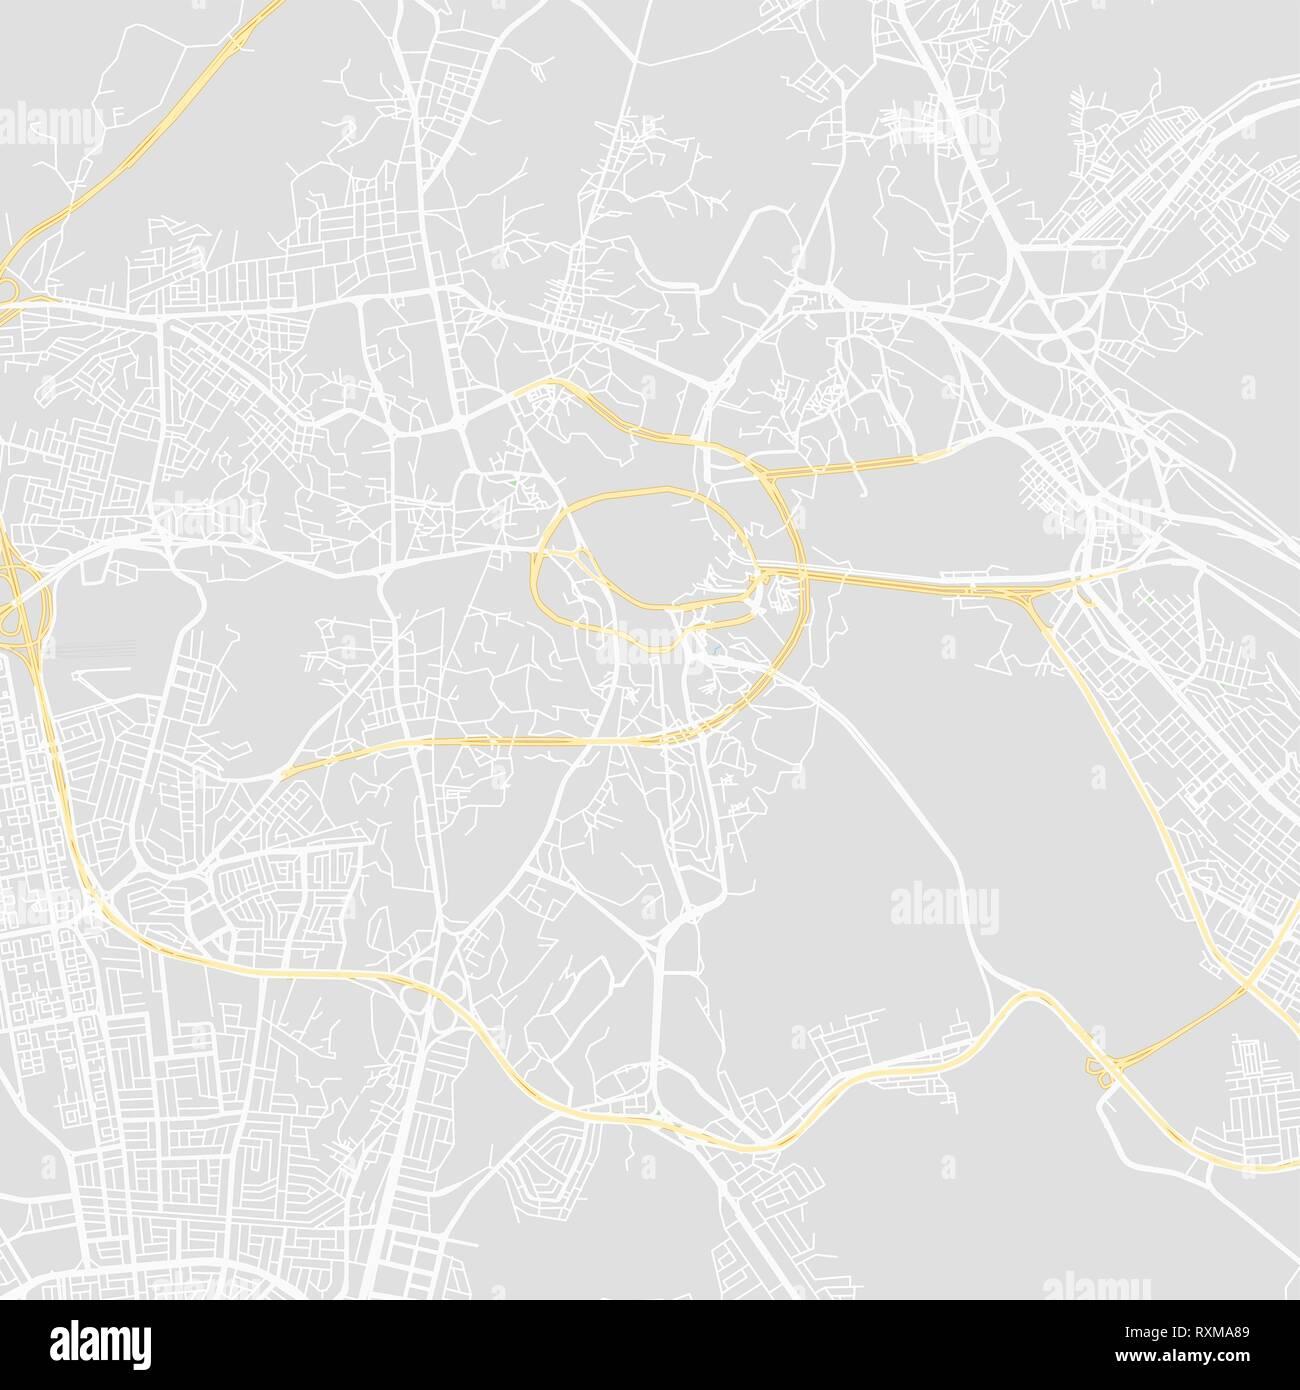 Map Of Mecca Stockfotos & Map Of Mecca Bilder - Alamy